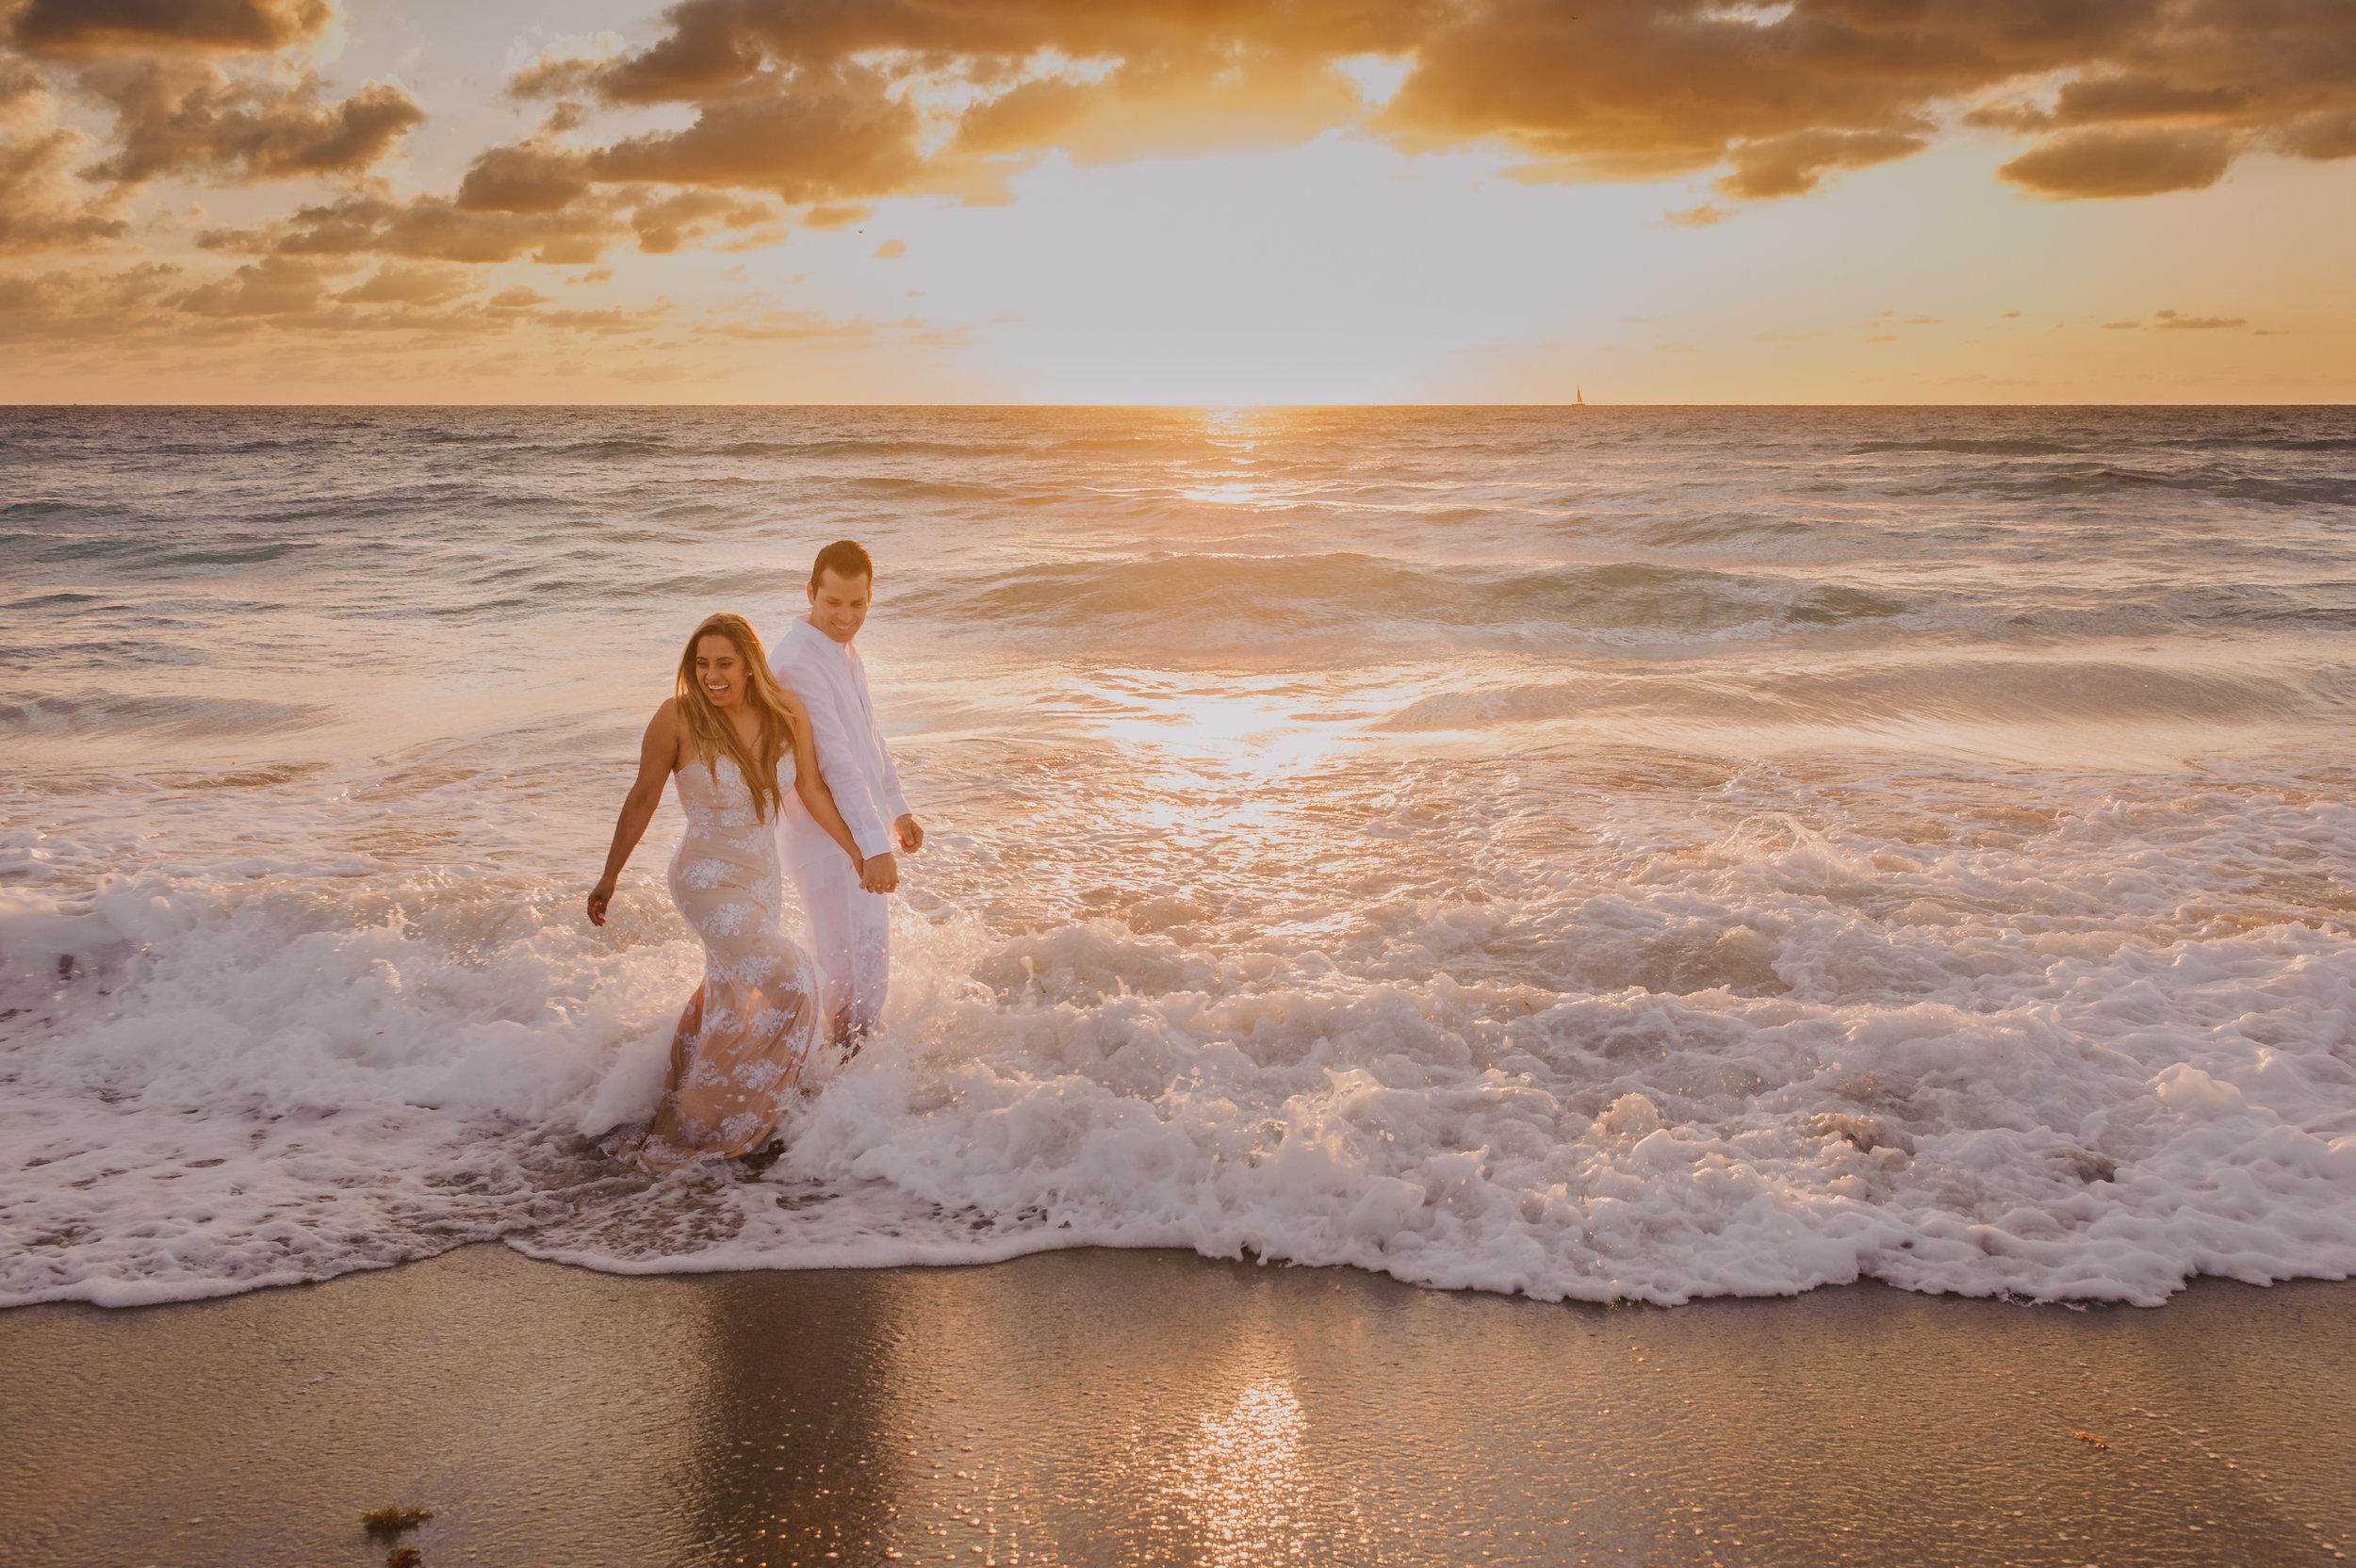 hollywood-beach-engagement-vanessa-and-johnny-photography-video-1Erika+AndyEngagement-13.jpg